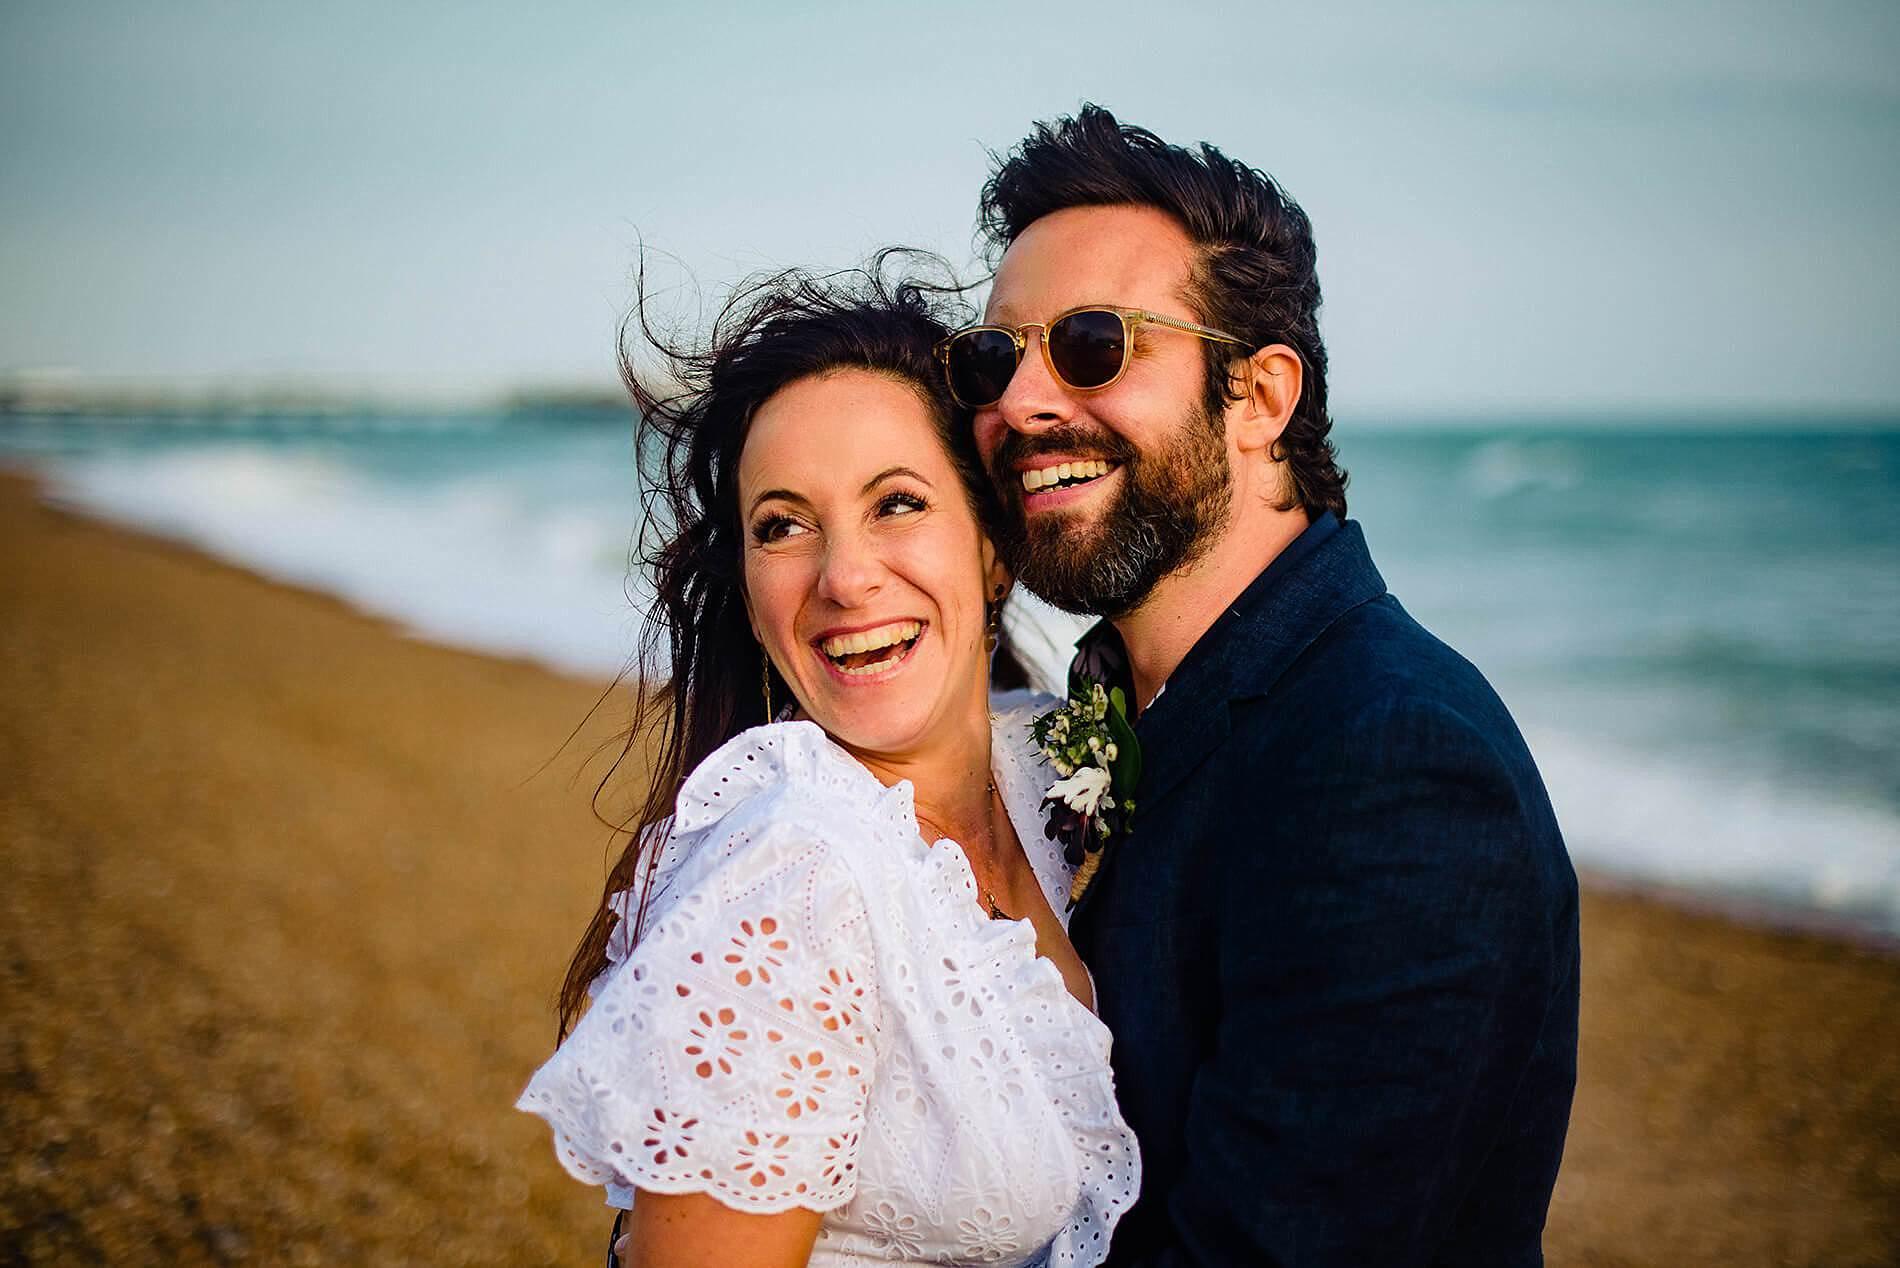 smiling bride and groom on brighton beach